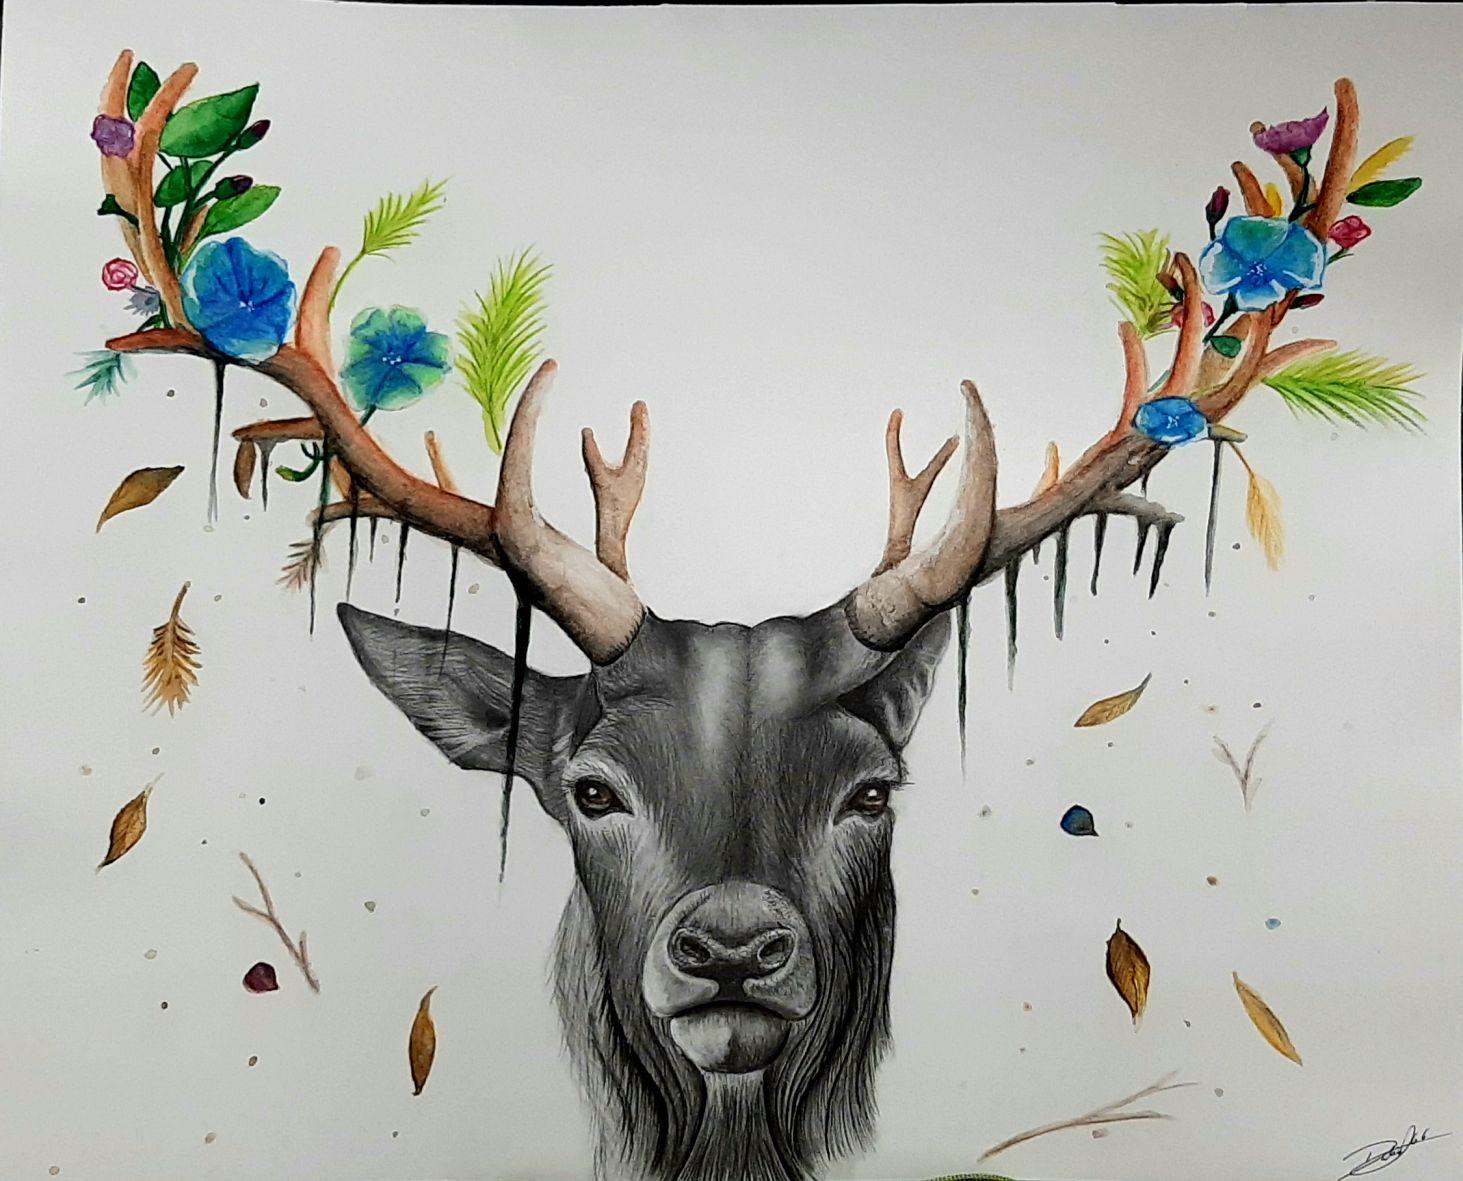 Mother nature (2019) - Dalia Quintana - Artdalia